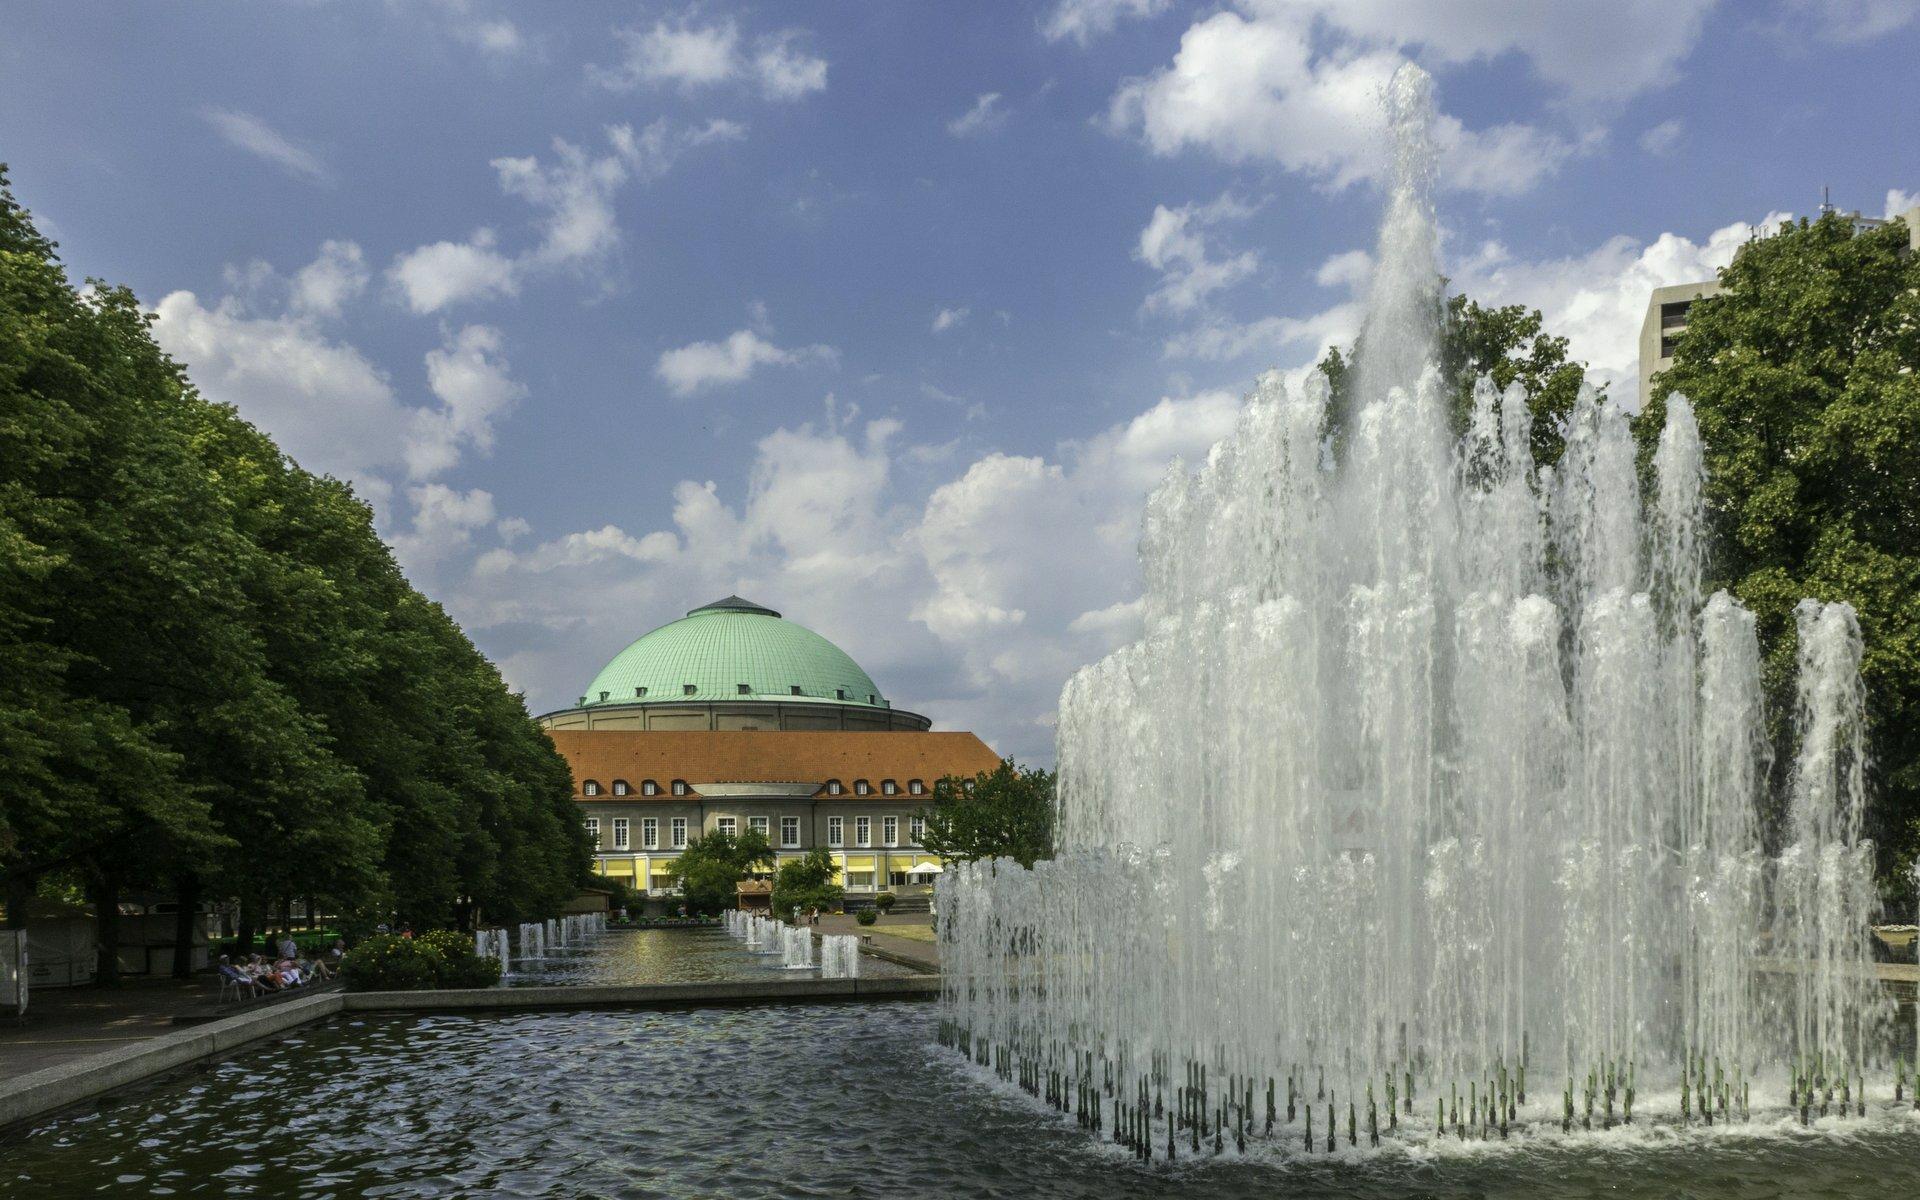 Fontainengarten und Kuppelsaal im Stadtpark